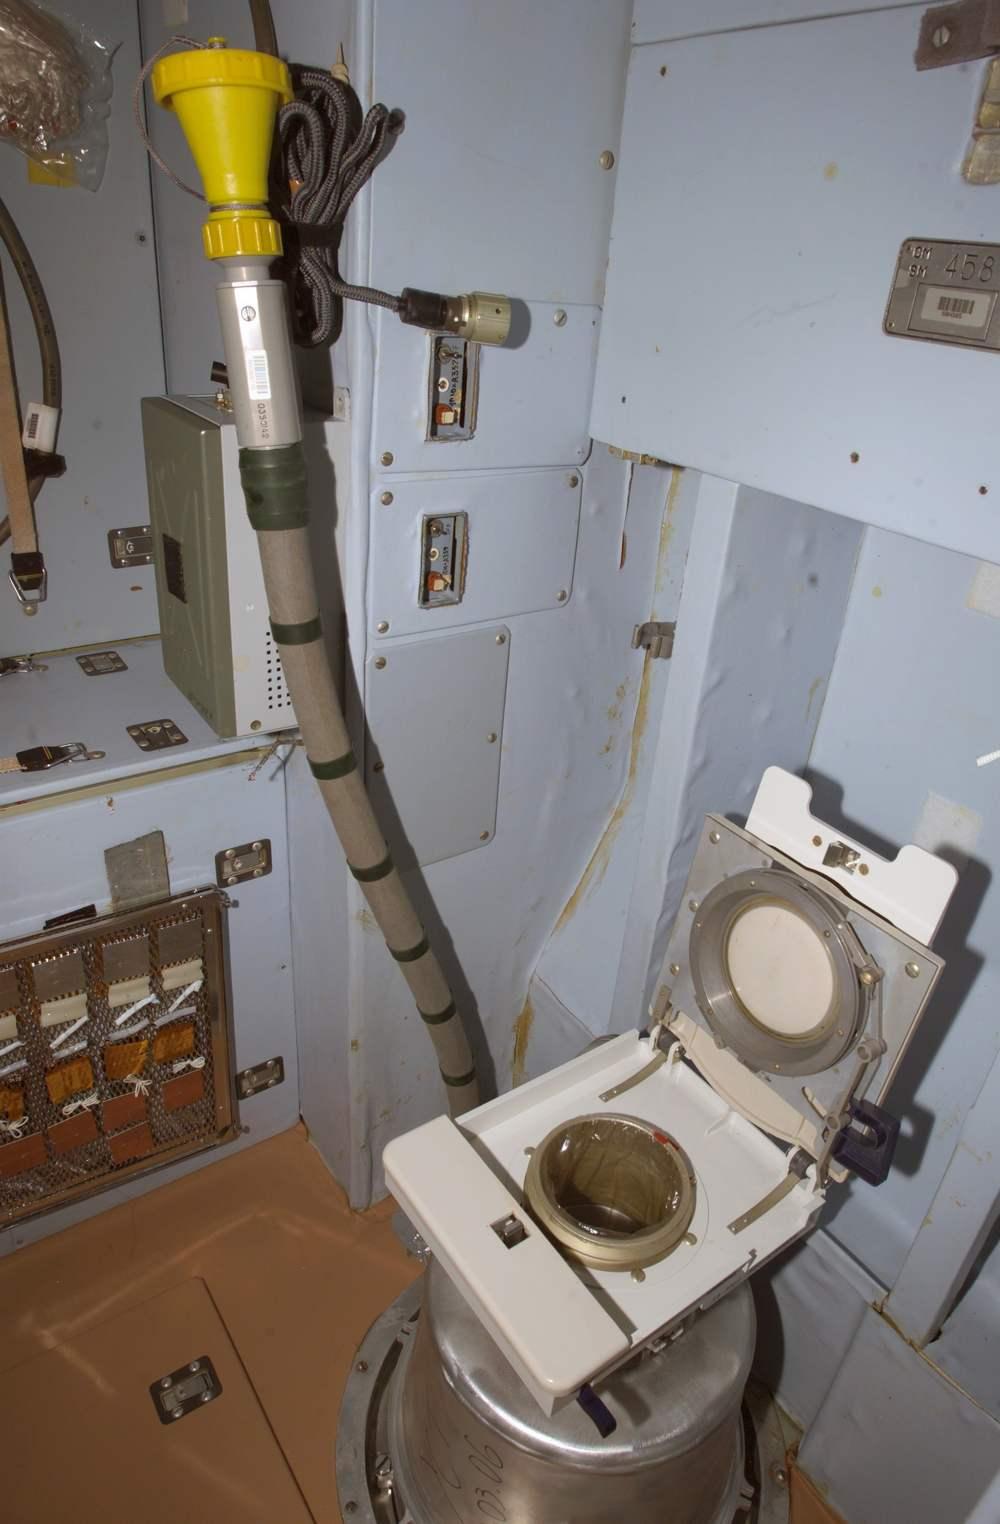 Toilet at the International Space Station. Image credit: NASA